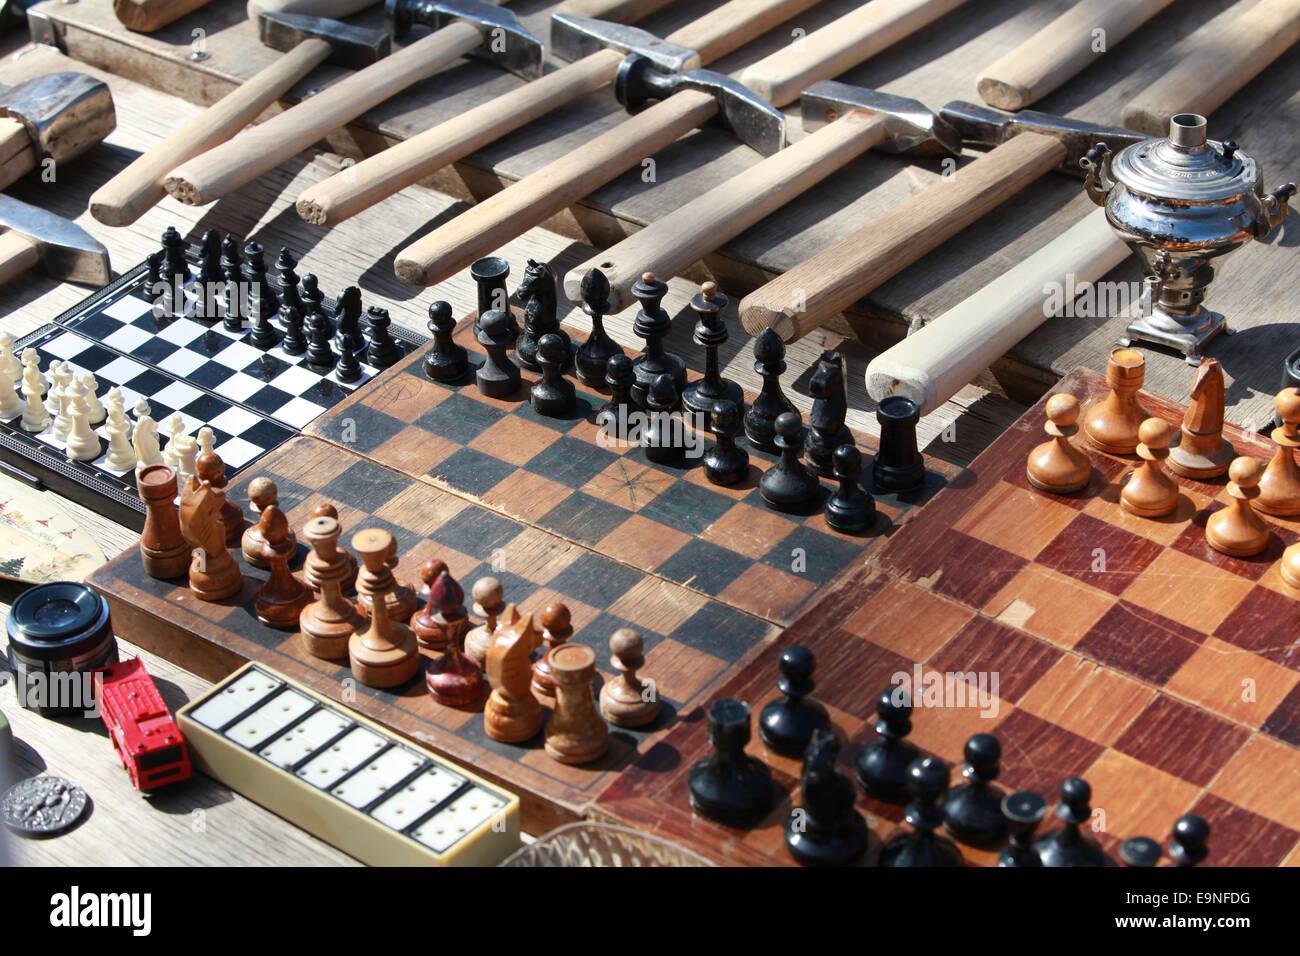 jeu d'échecs Banque D'Images